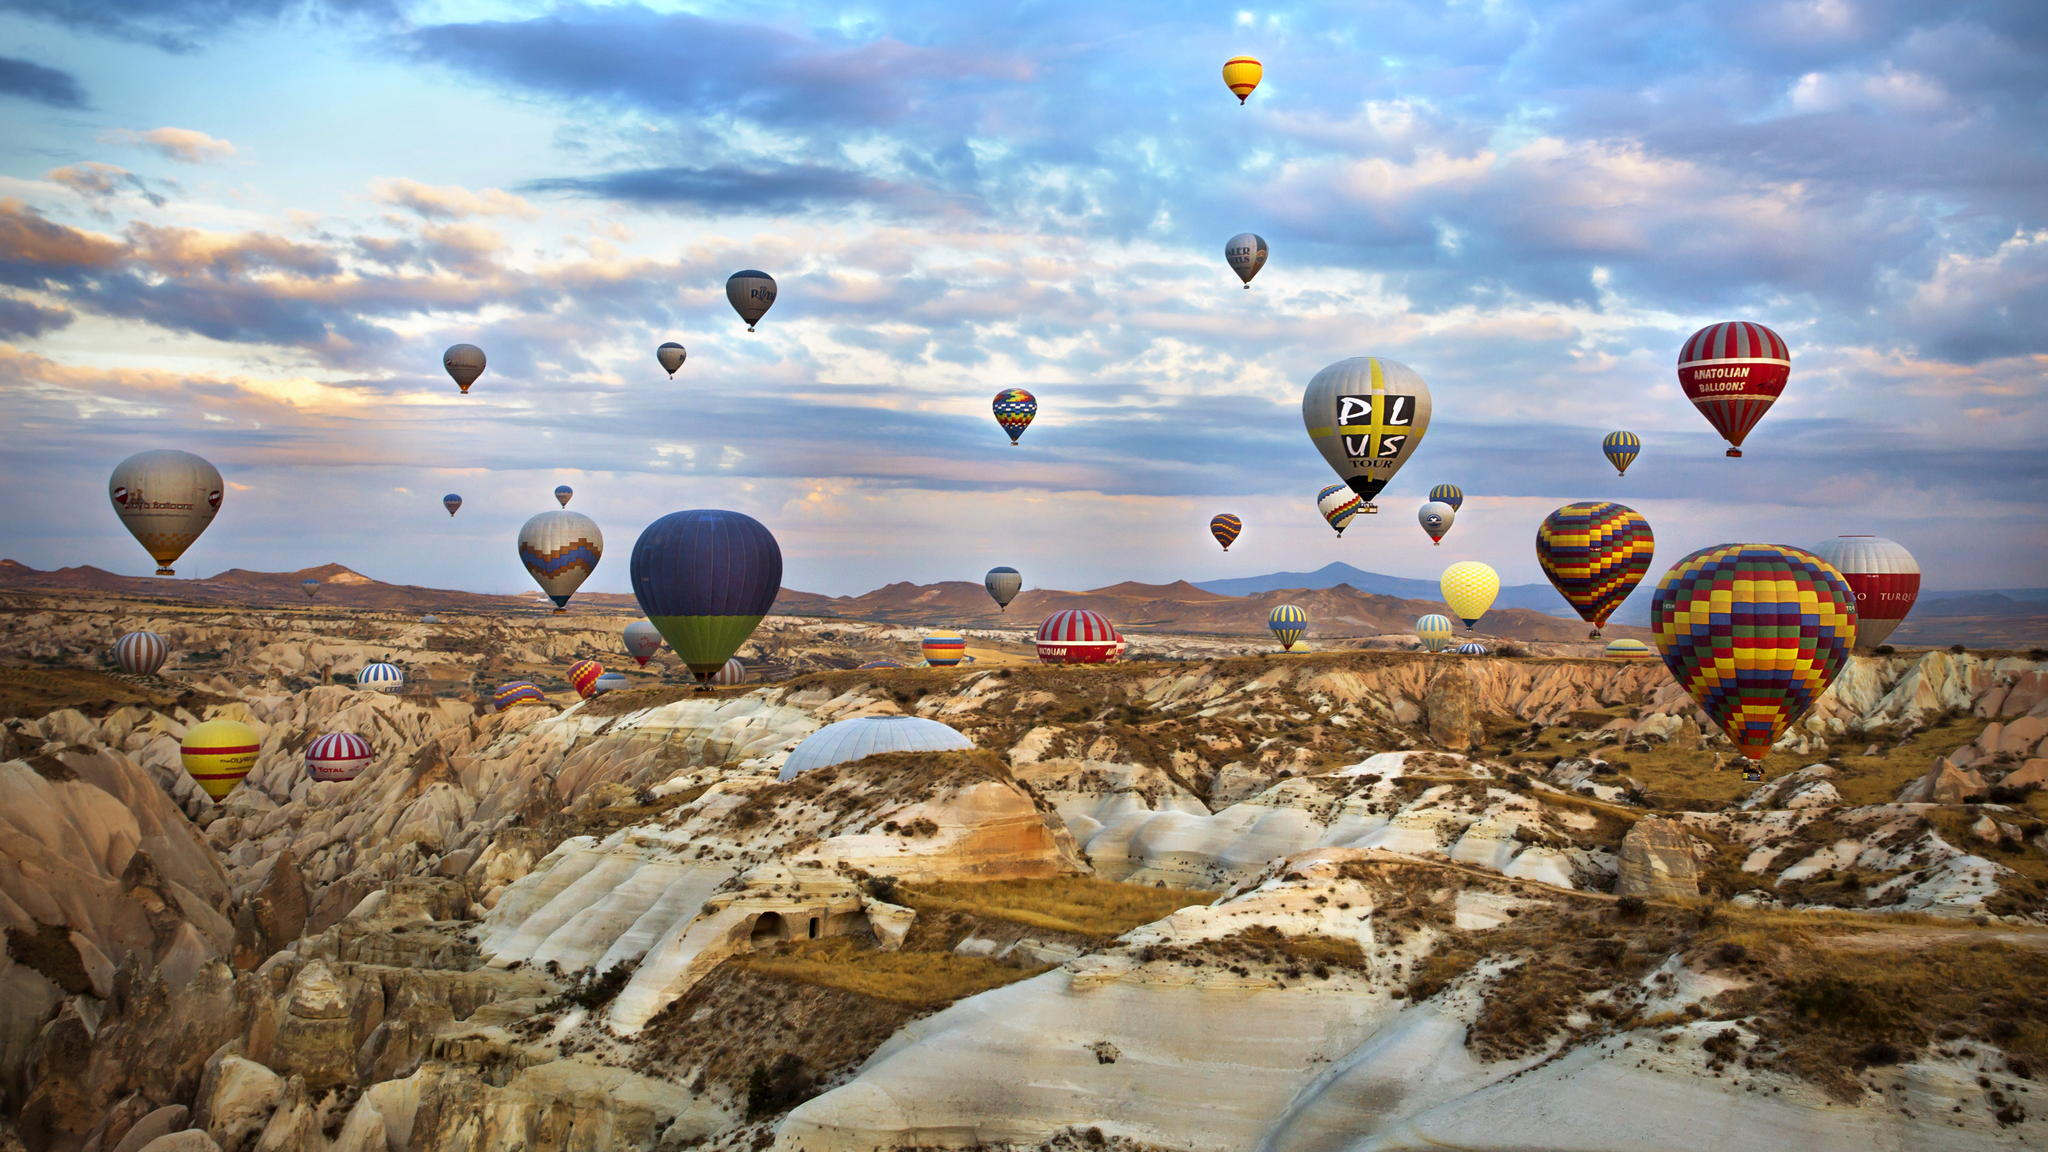 Cappadocia-hot-air-balloon-desktop-background-wallpaper-image-free-download